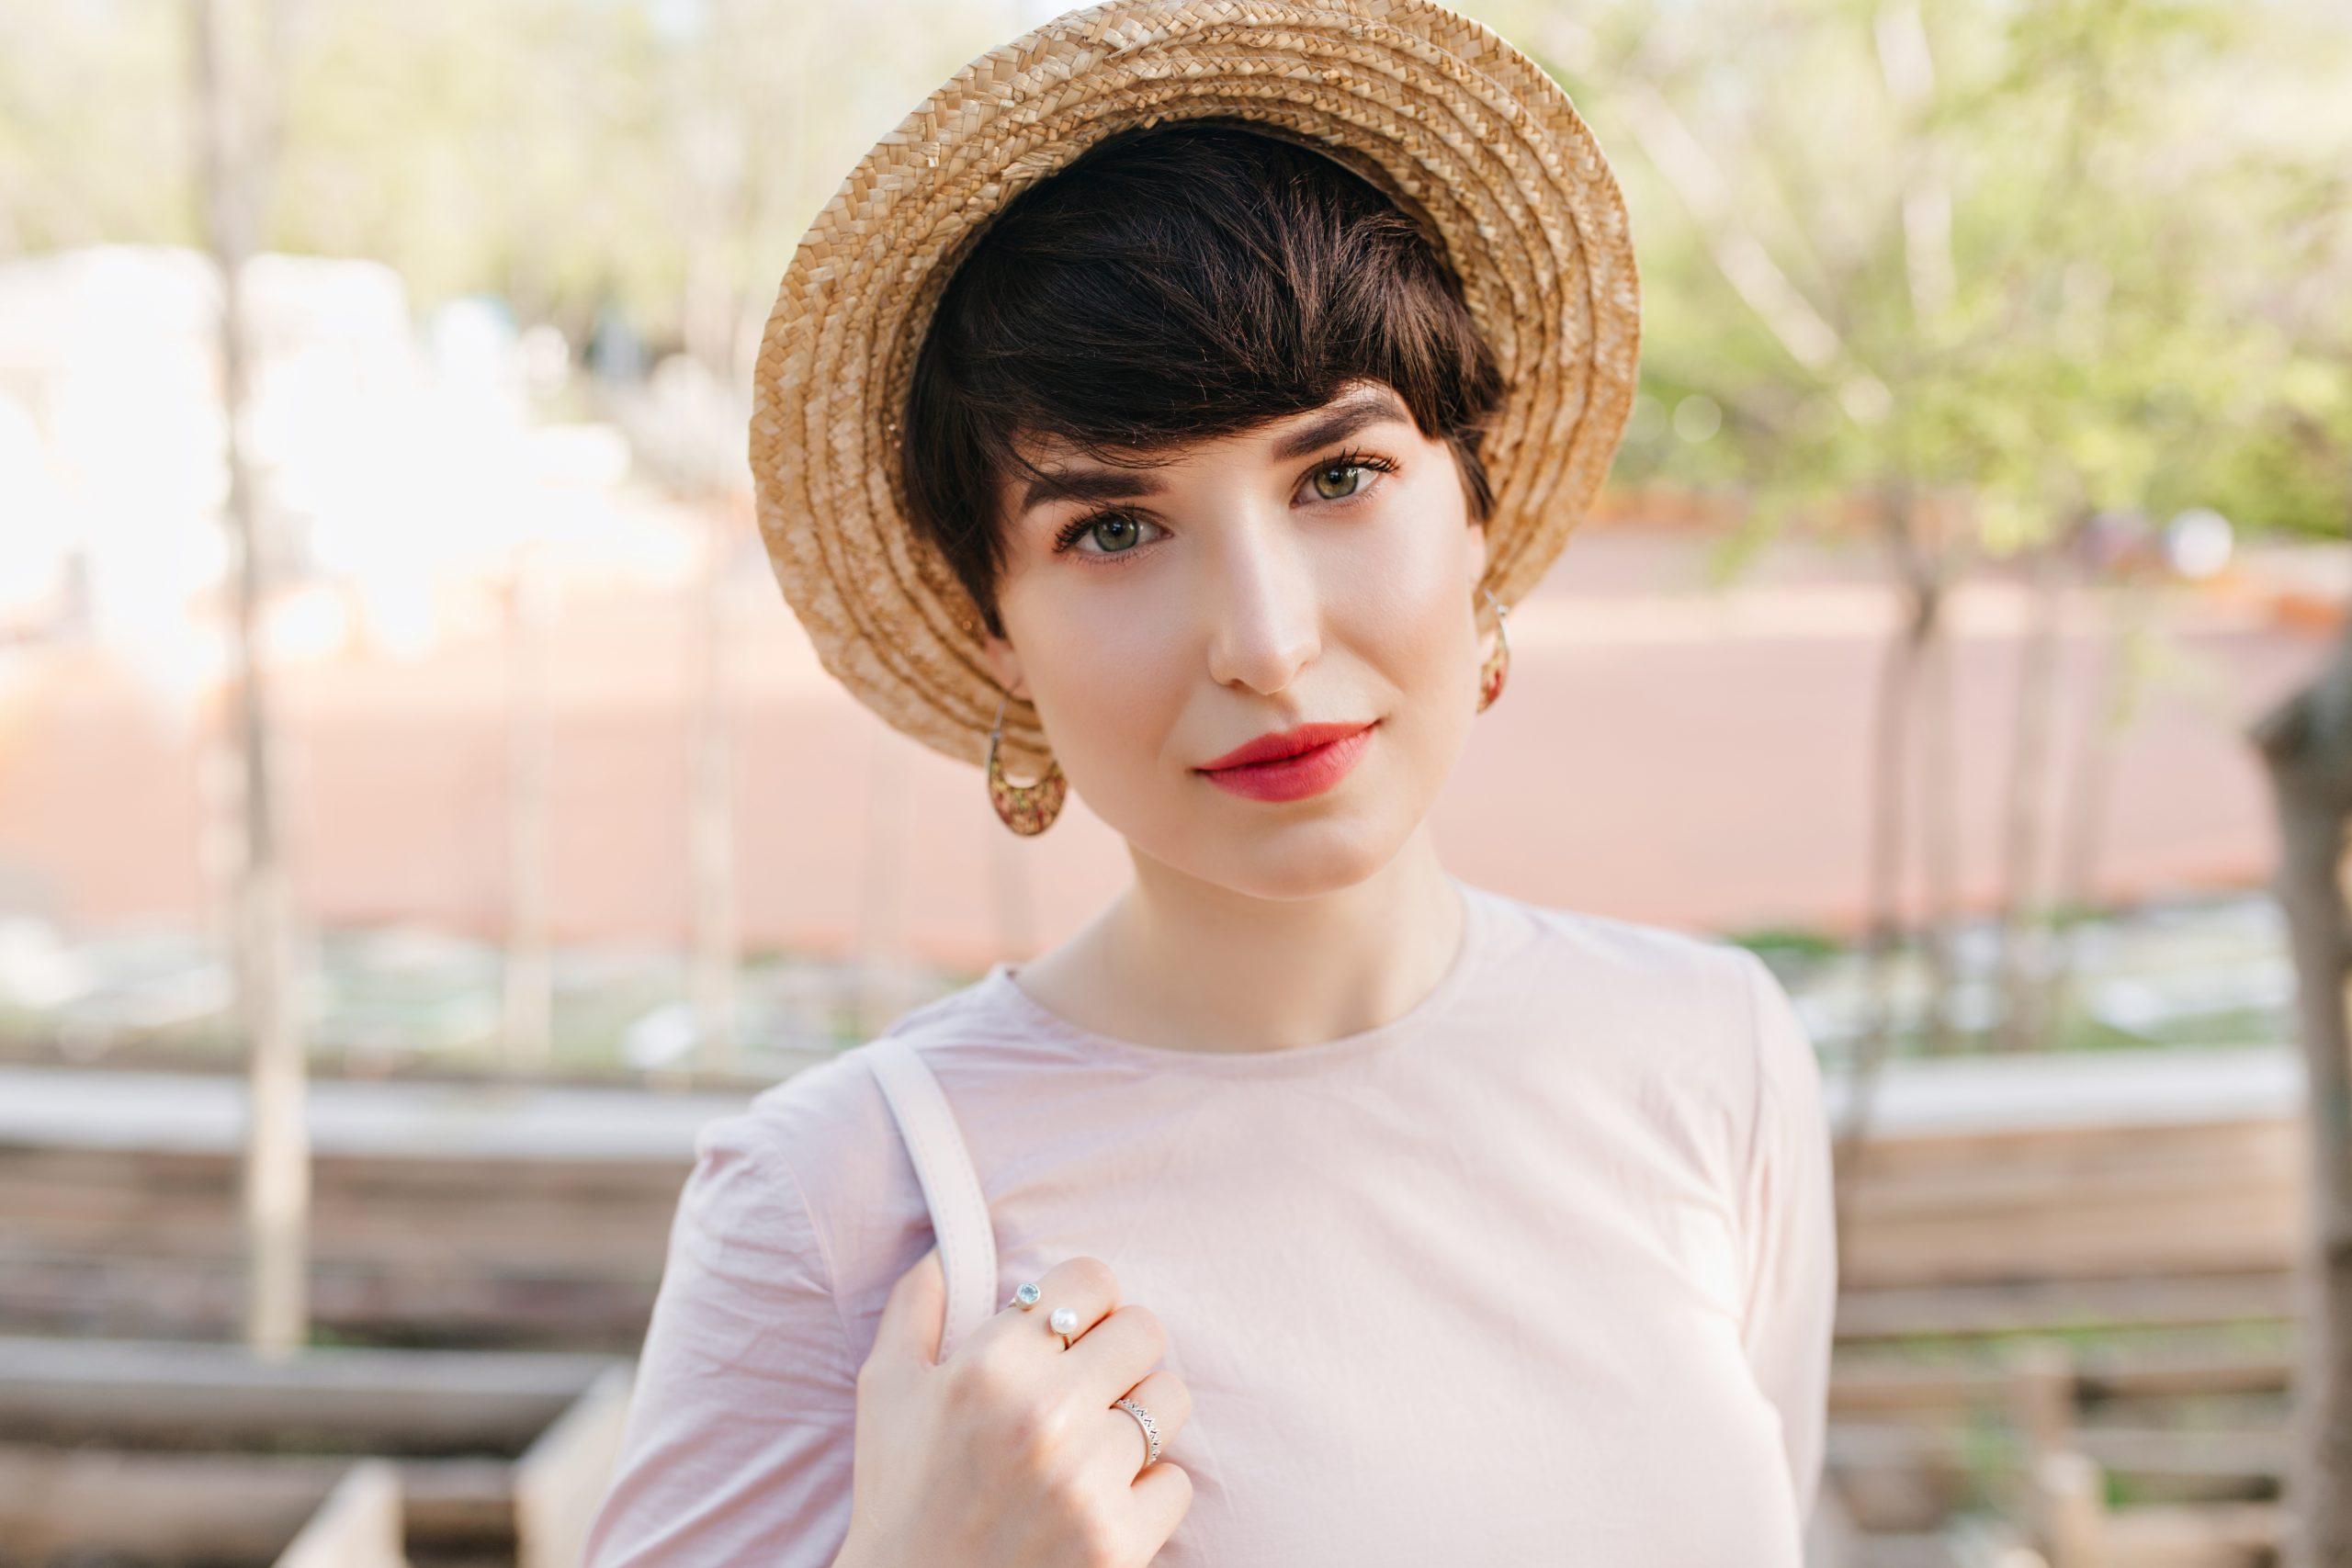 Ukrainian Wonderful young woman with big green eyes